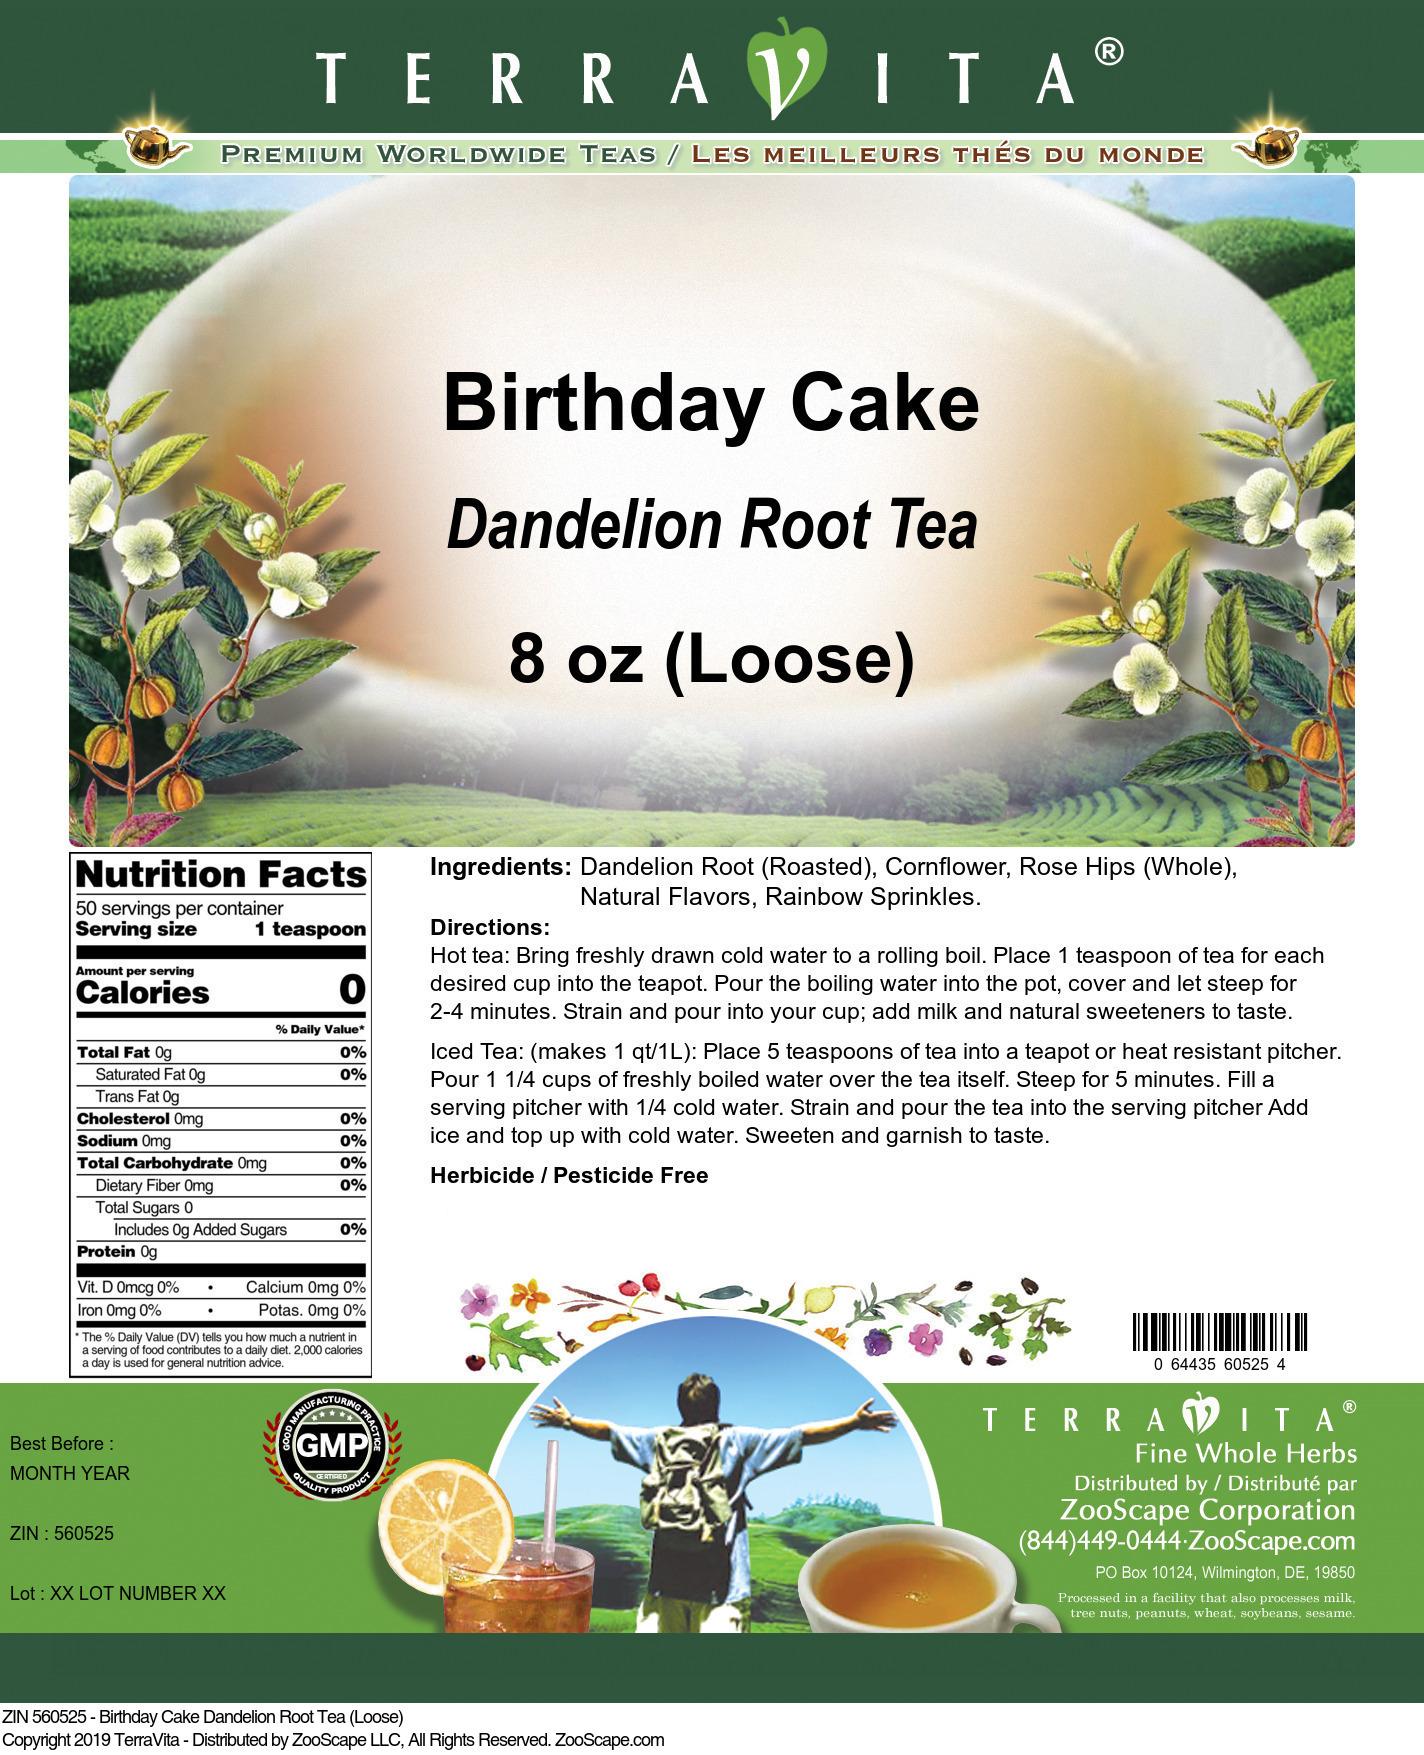 Birthday Cake Dandelion Root